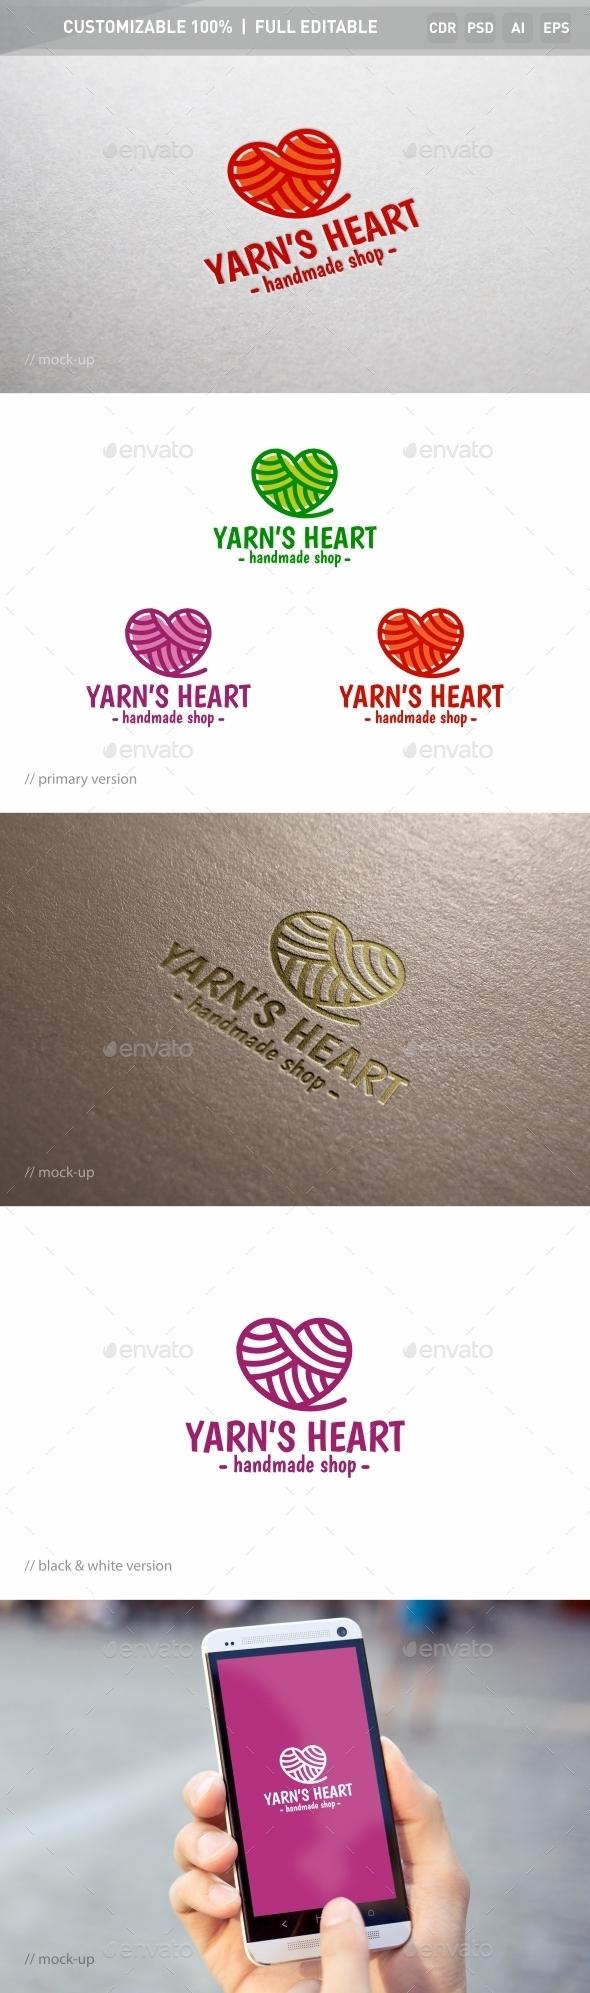 Yarn's Heart Logo Template - Objects Logo Templates